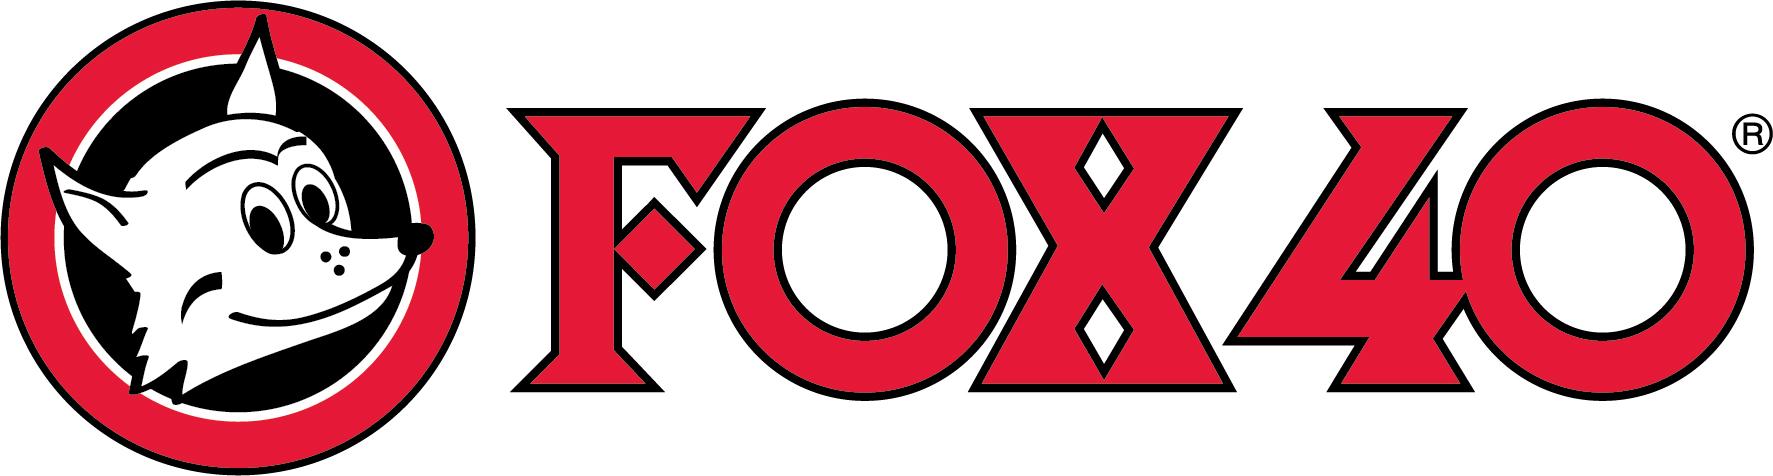 fox40 logo